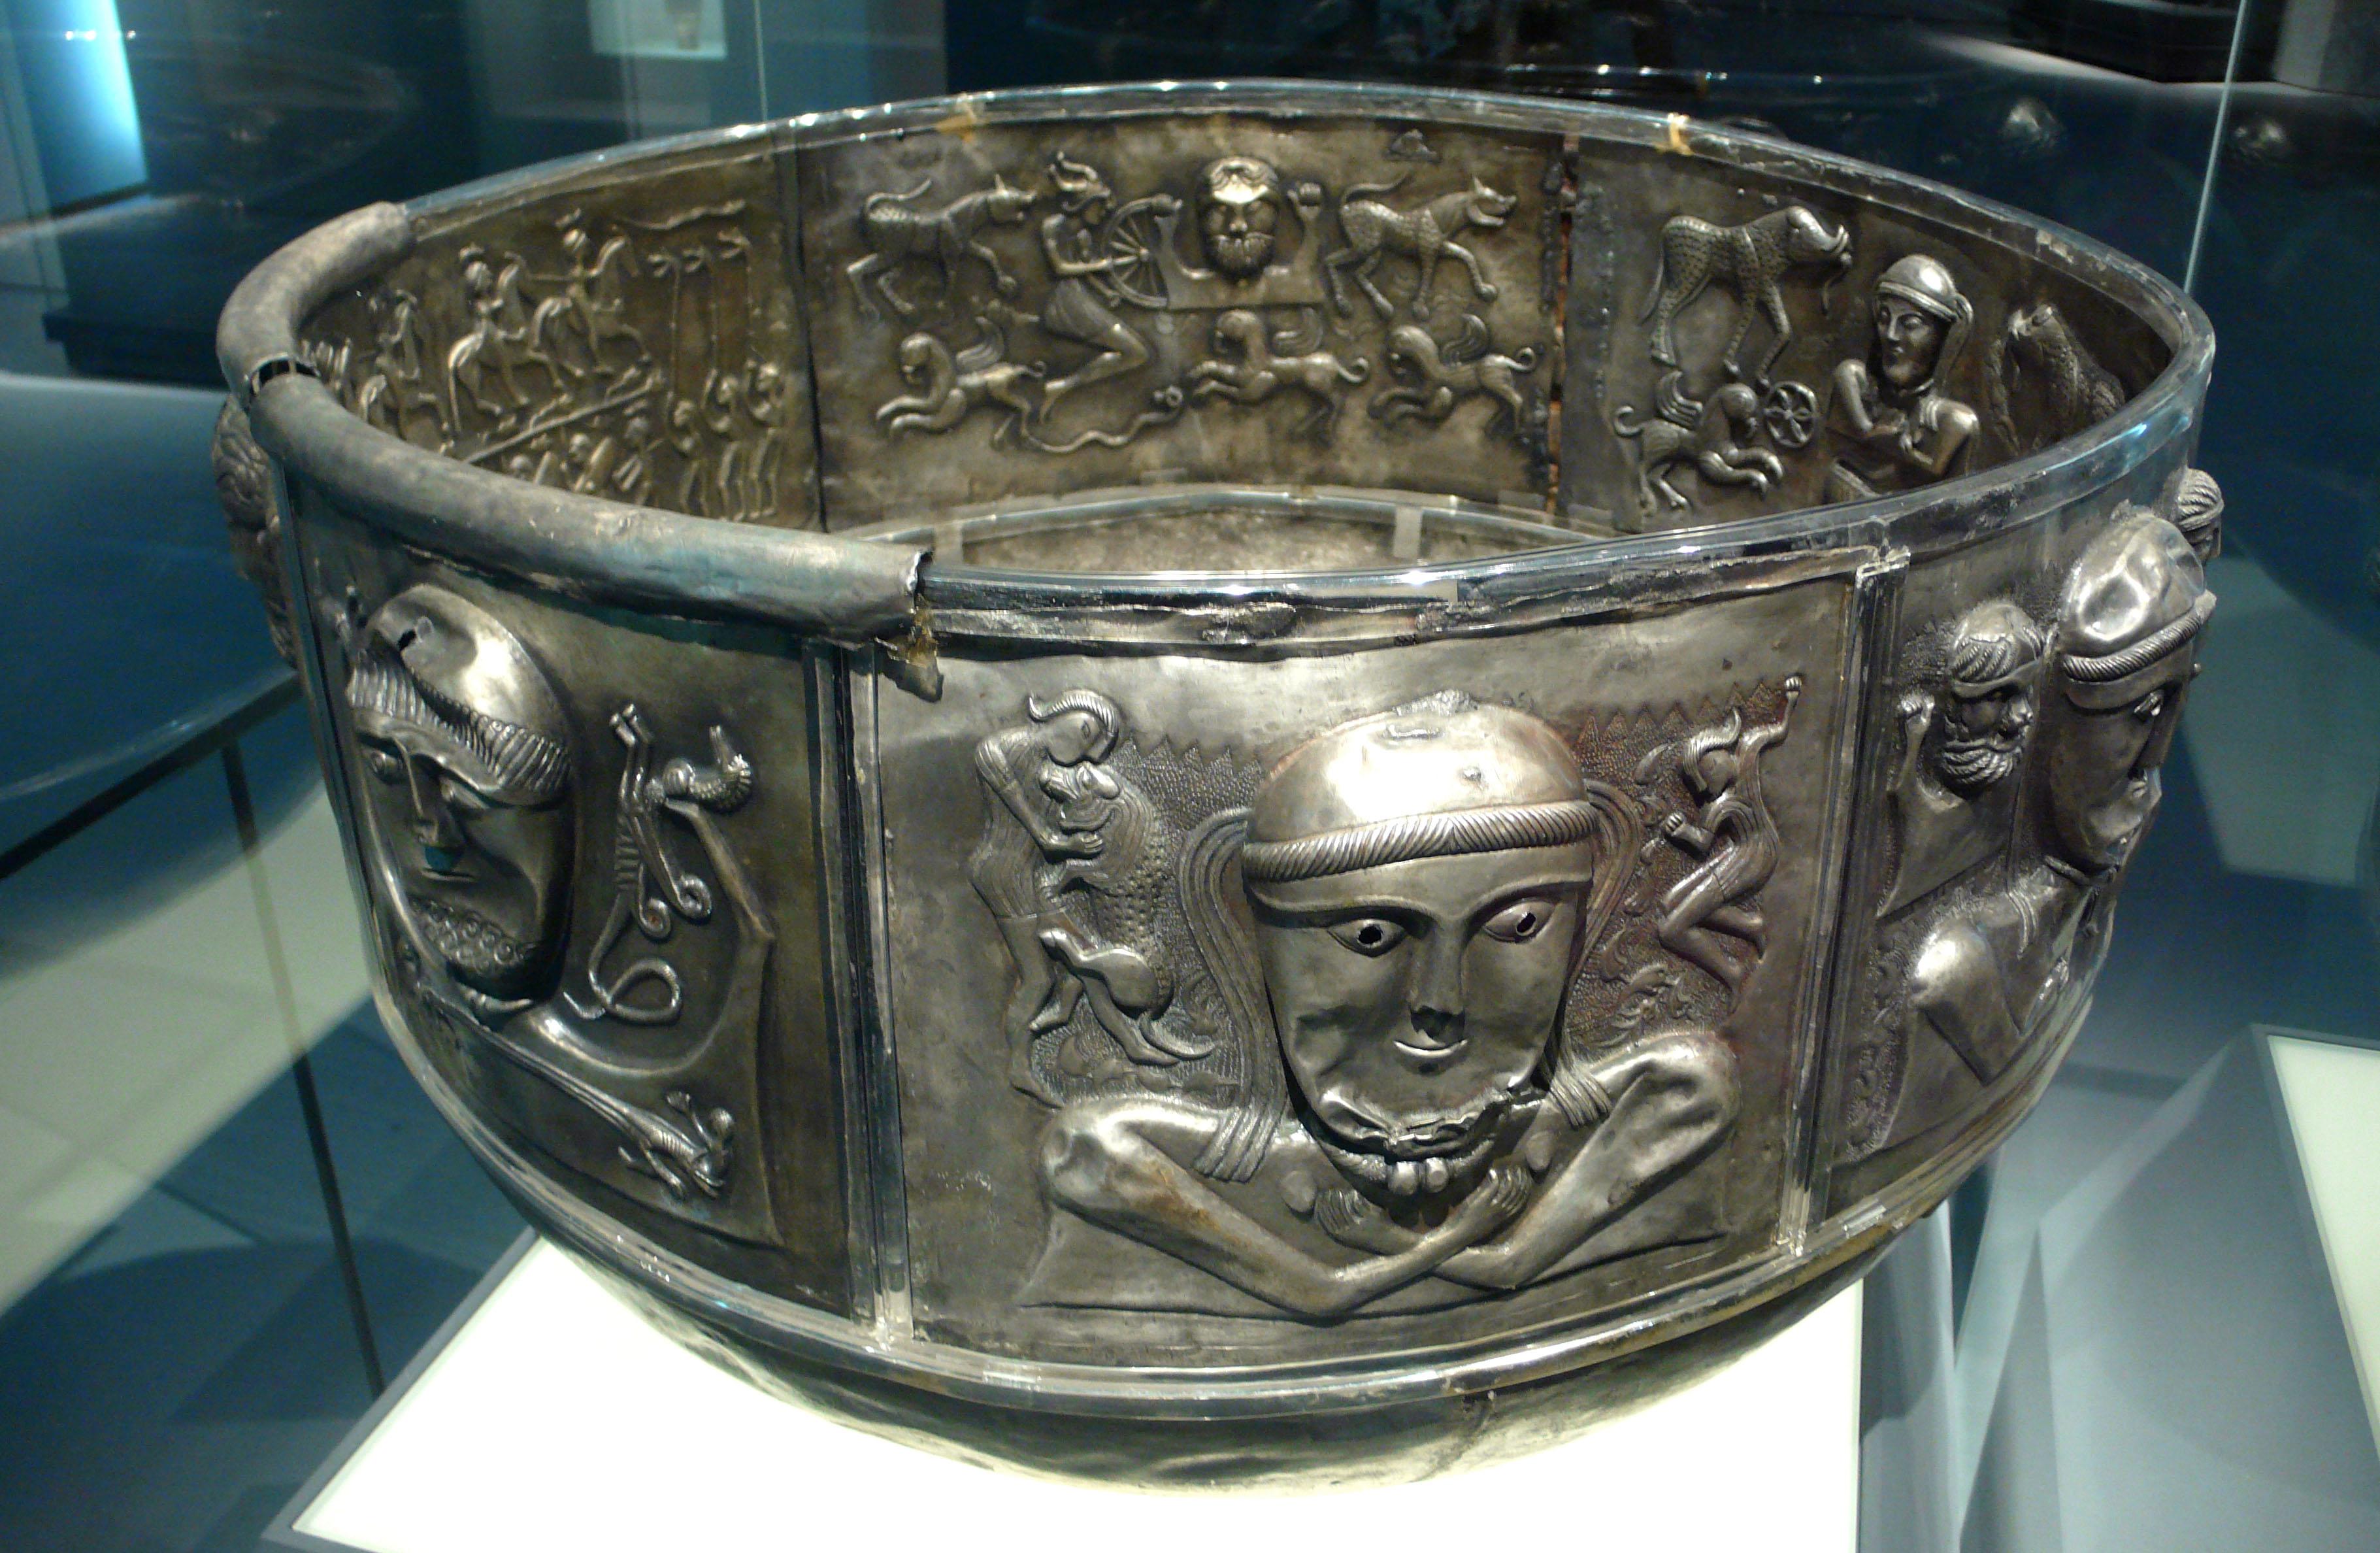 https://i0.wp.com/upload.wikimedia.org/wikipedia/commons/1/12/Silver_cauldron.jpg